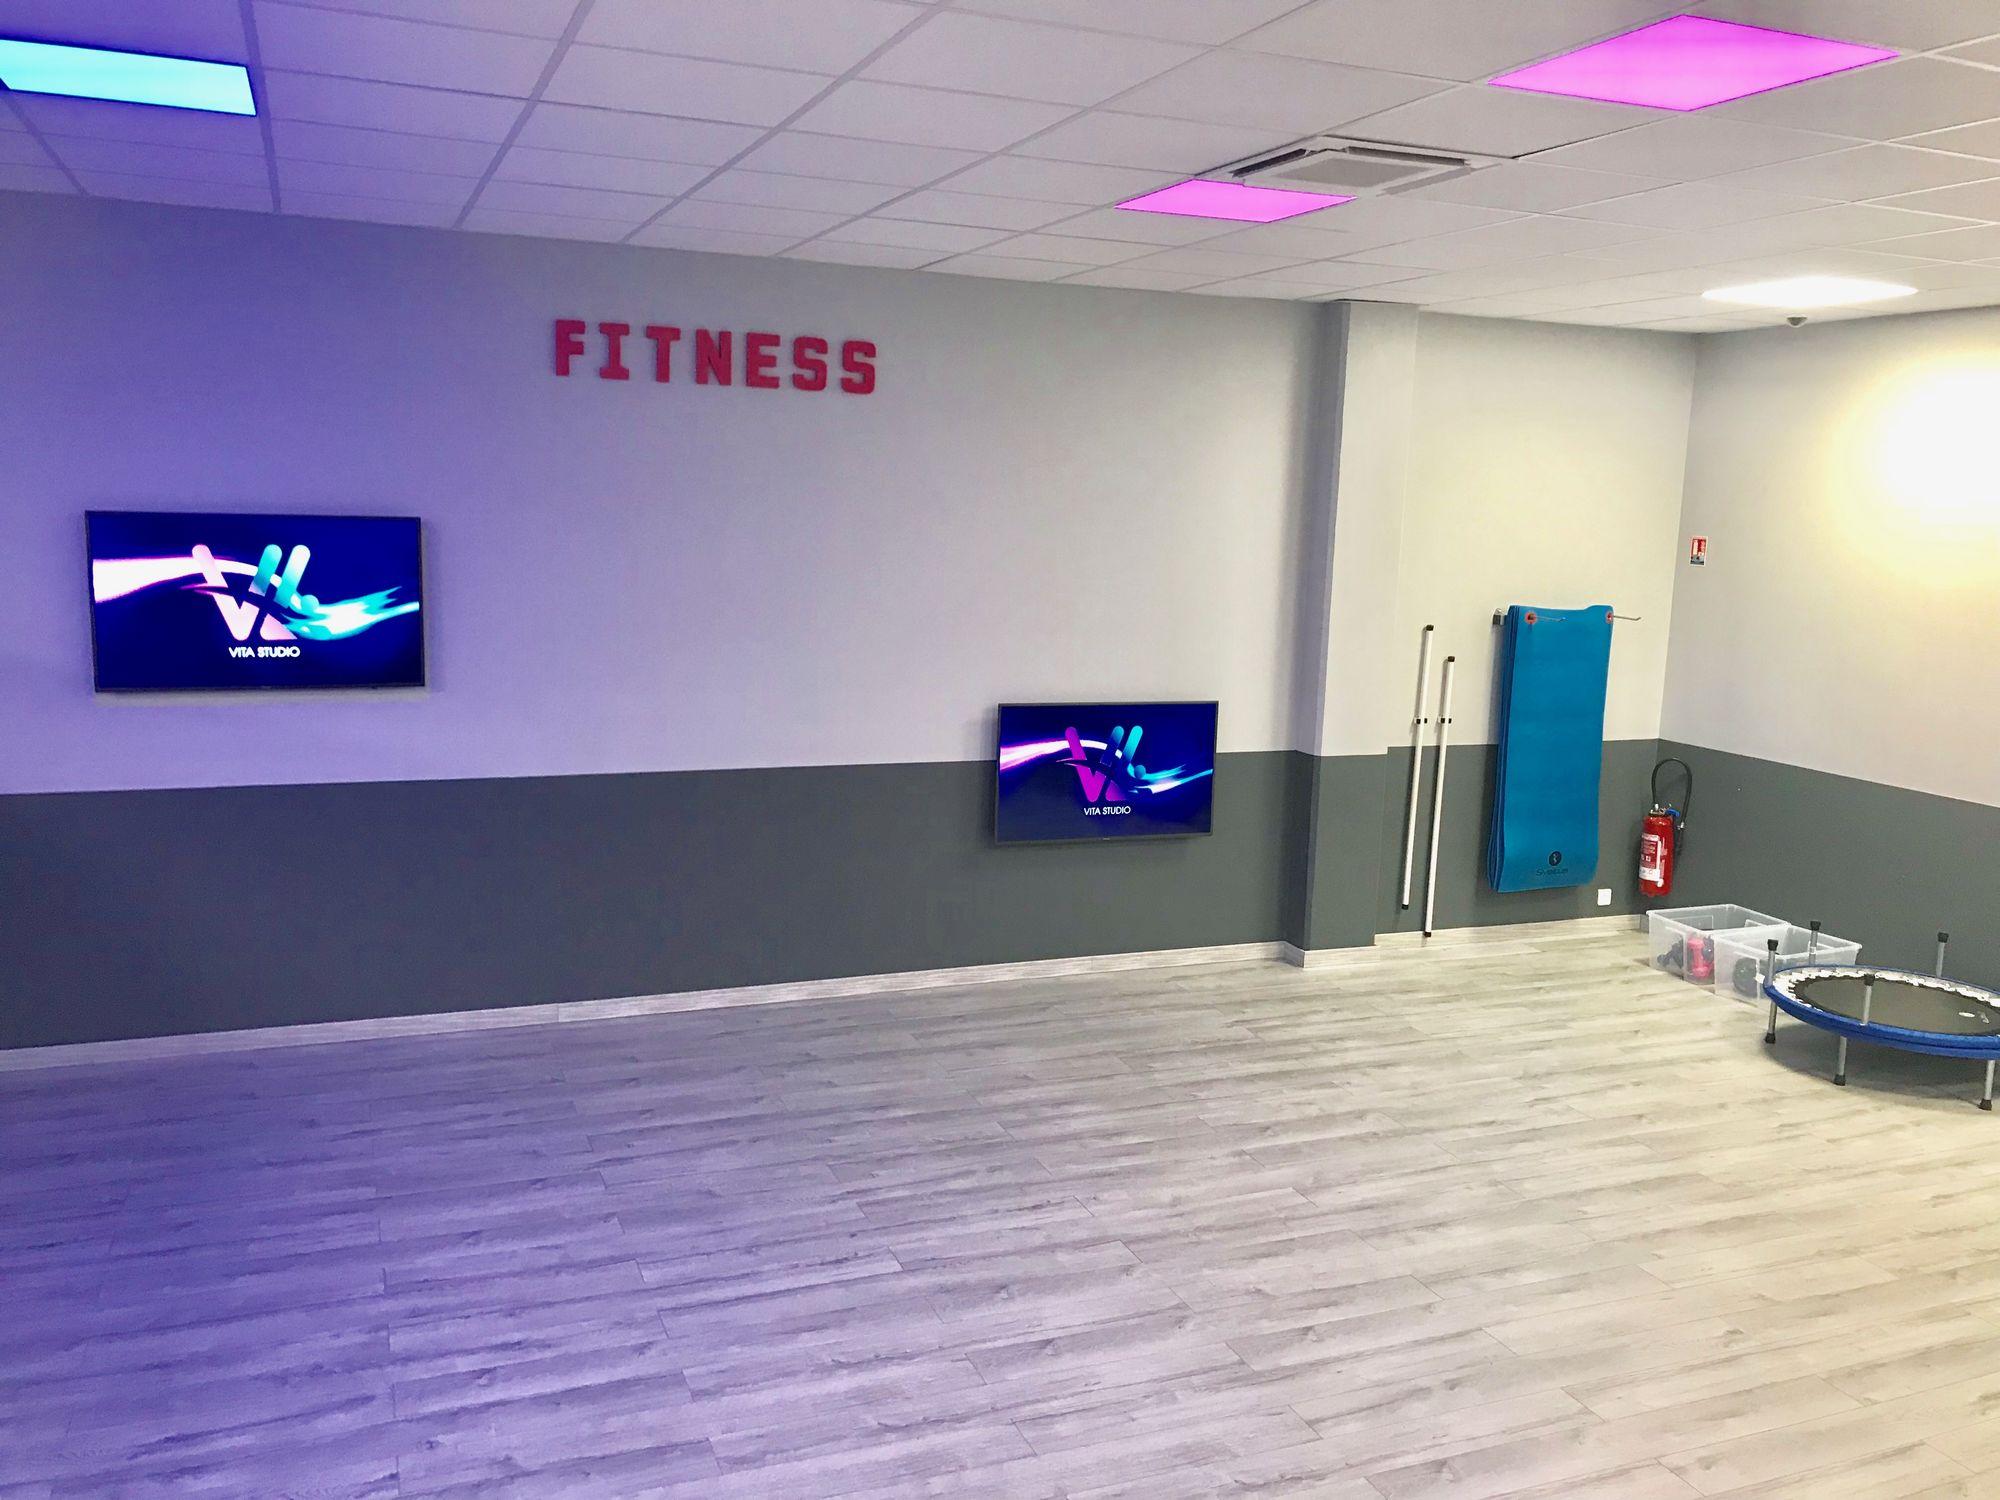 Salle de sport Vita liberté Martigues Fitness